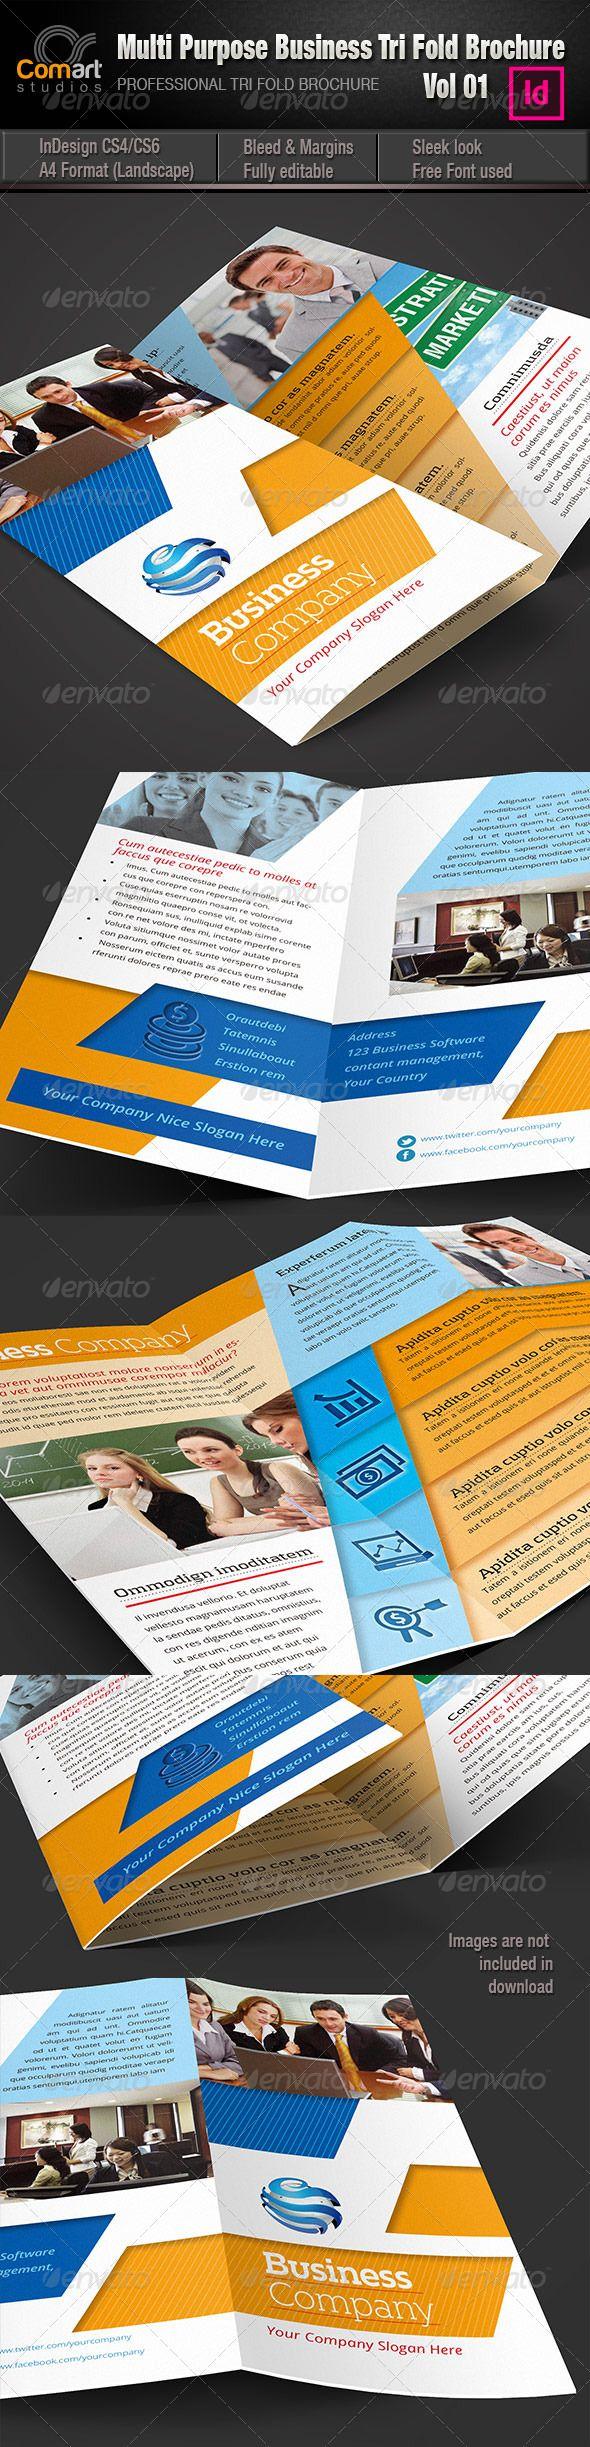 cs multipurpose tri fold brochure vol 01 pinterest tri fold